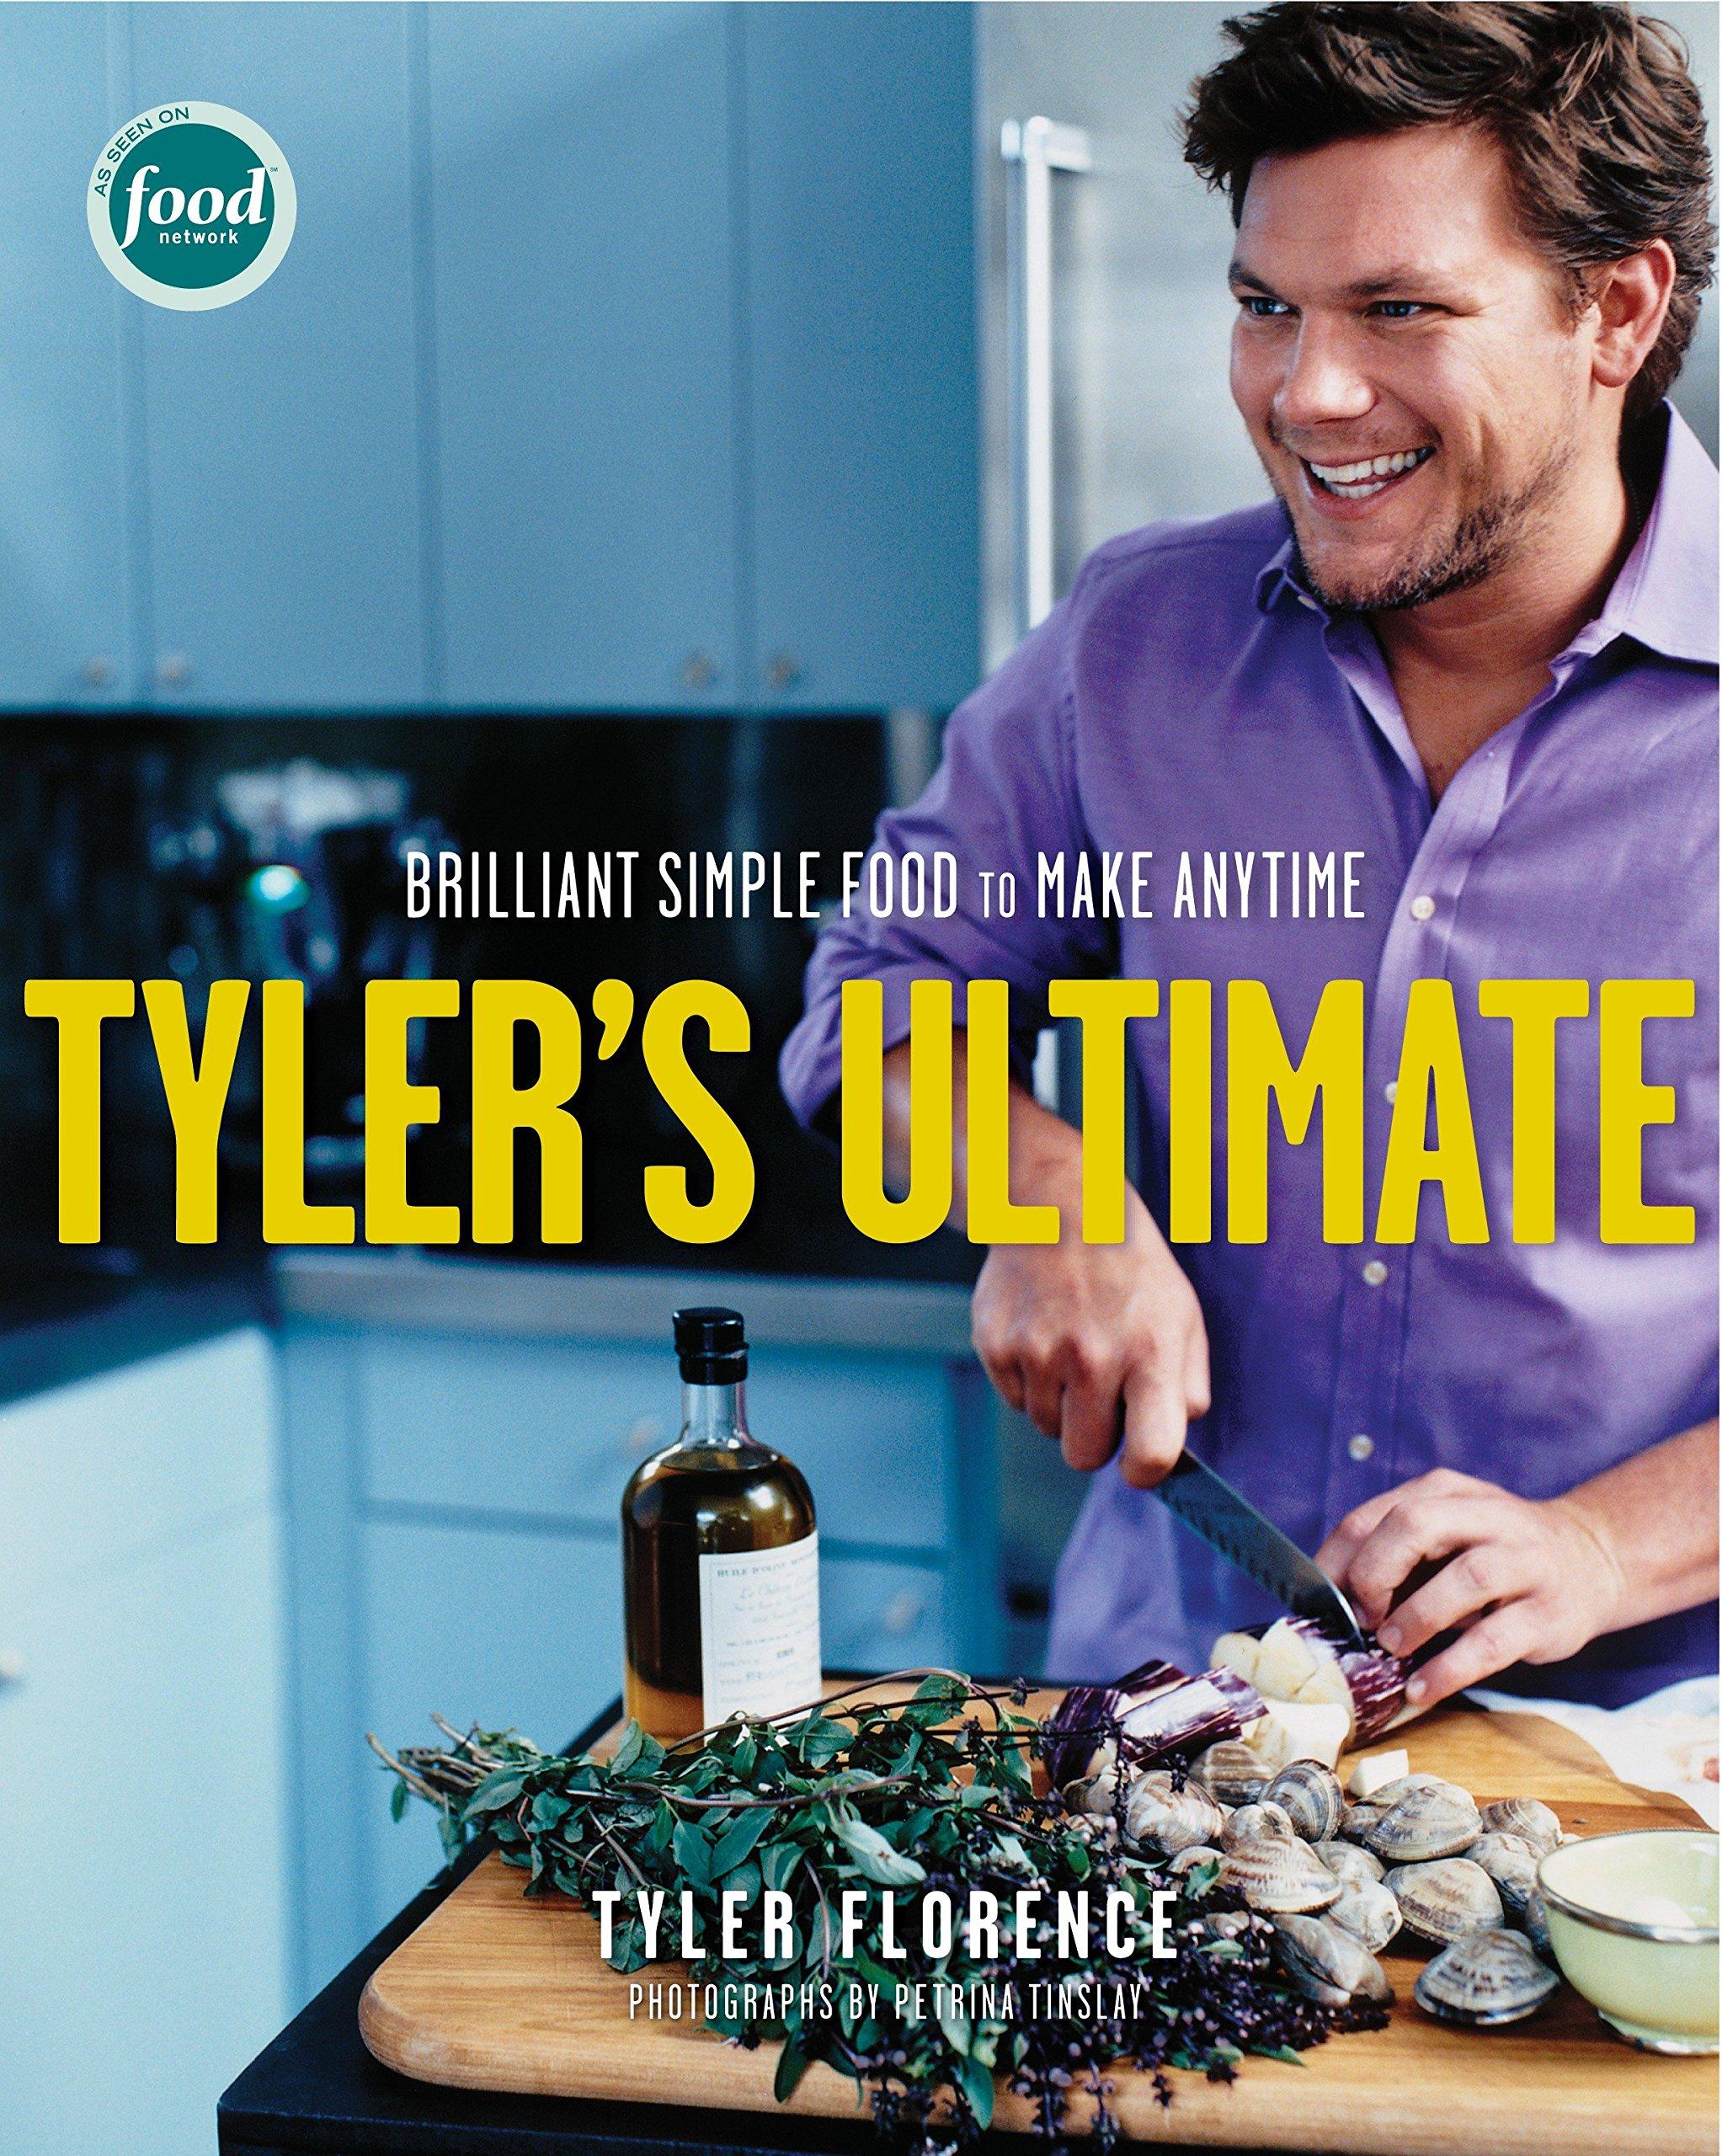 Tylers ultimate brilliant simple food to make any time tyler tylers ultimate brilliant simple food to make any time tyler florence 9781400052387 amazon books forumfinder Gallery